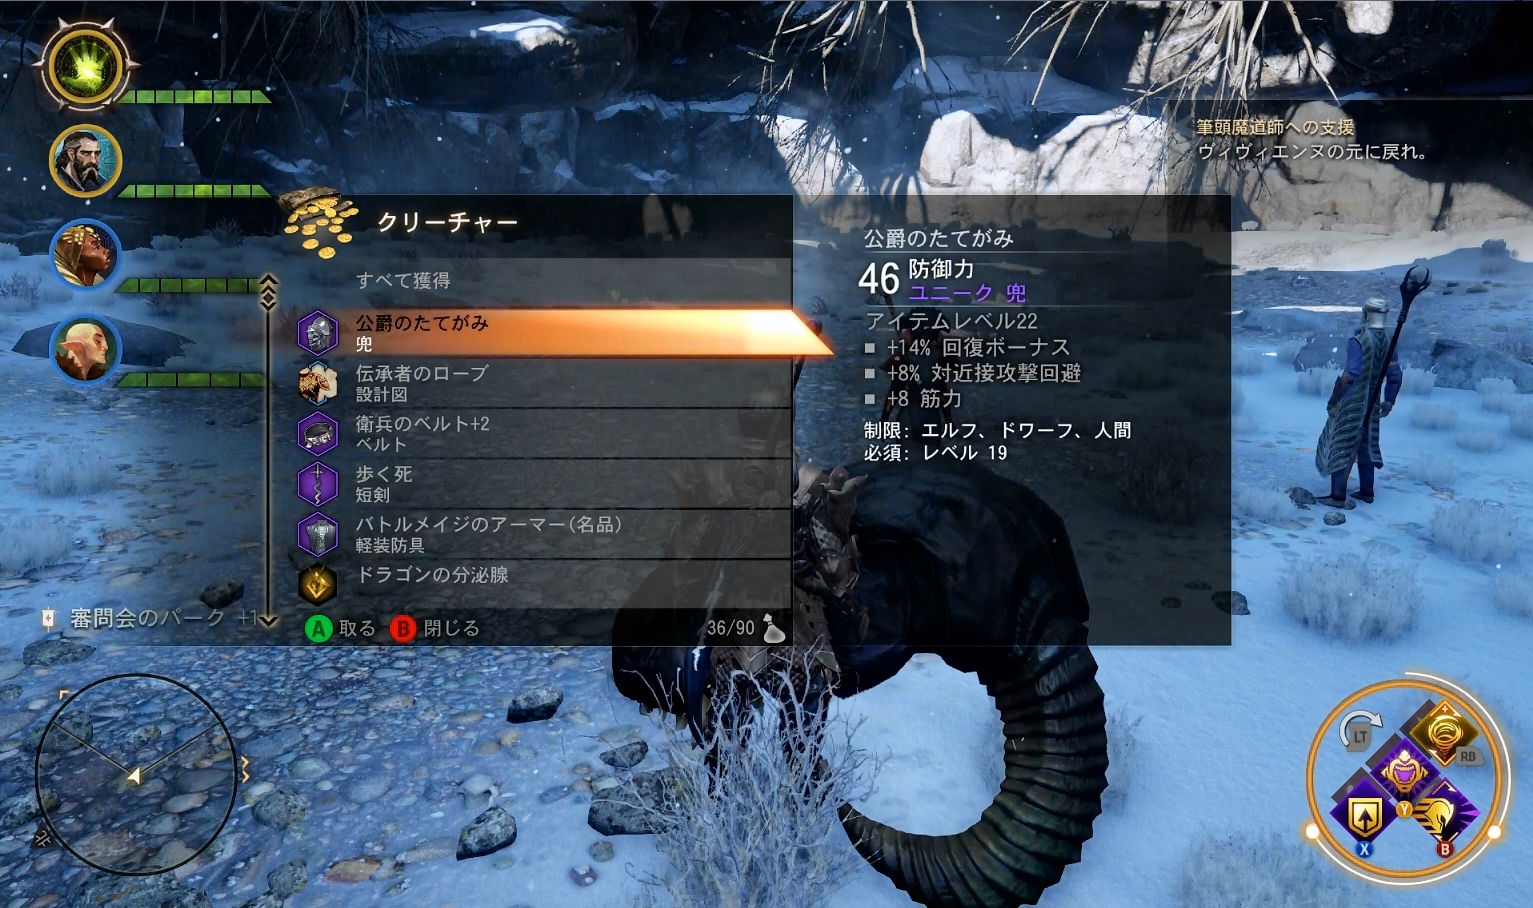 DAI19_024.jpg